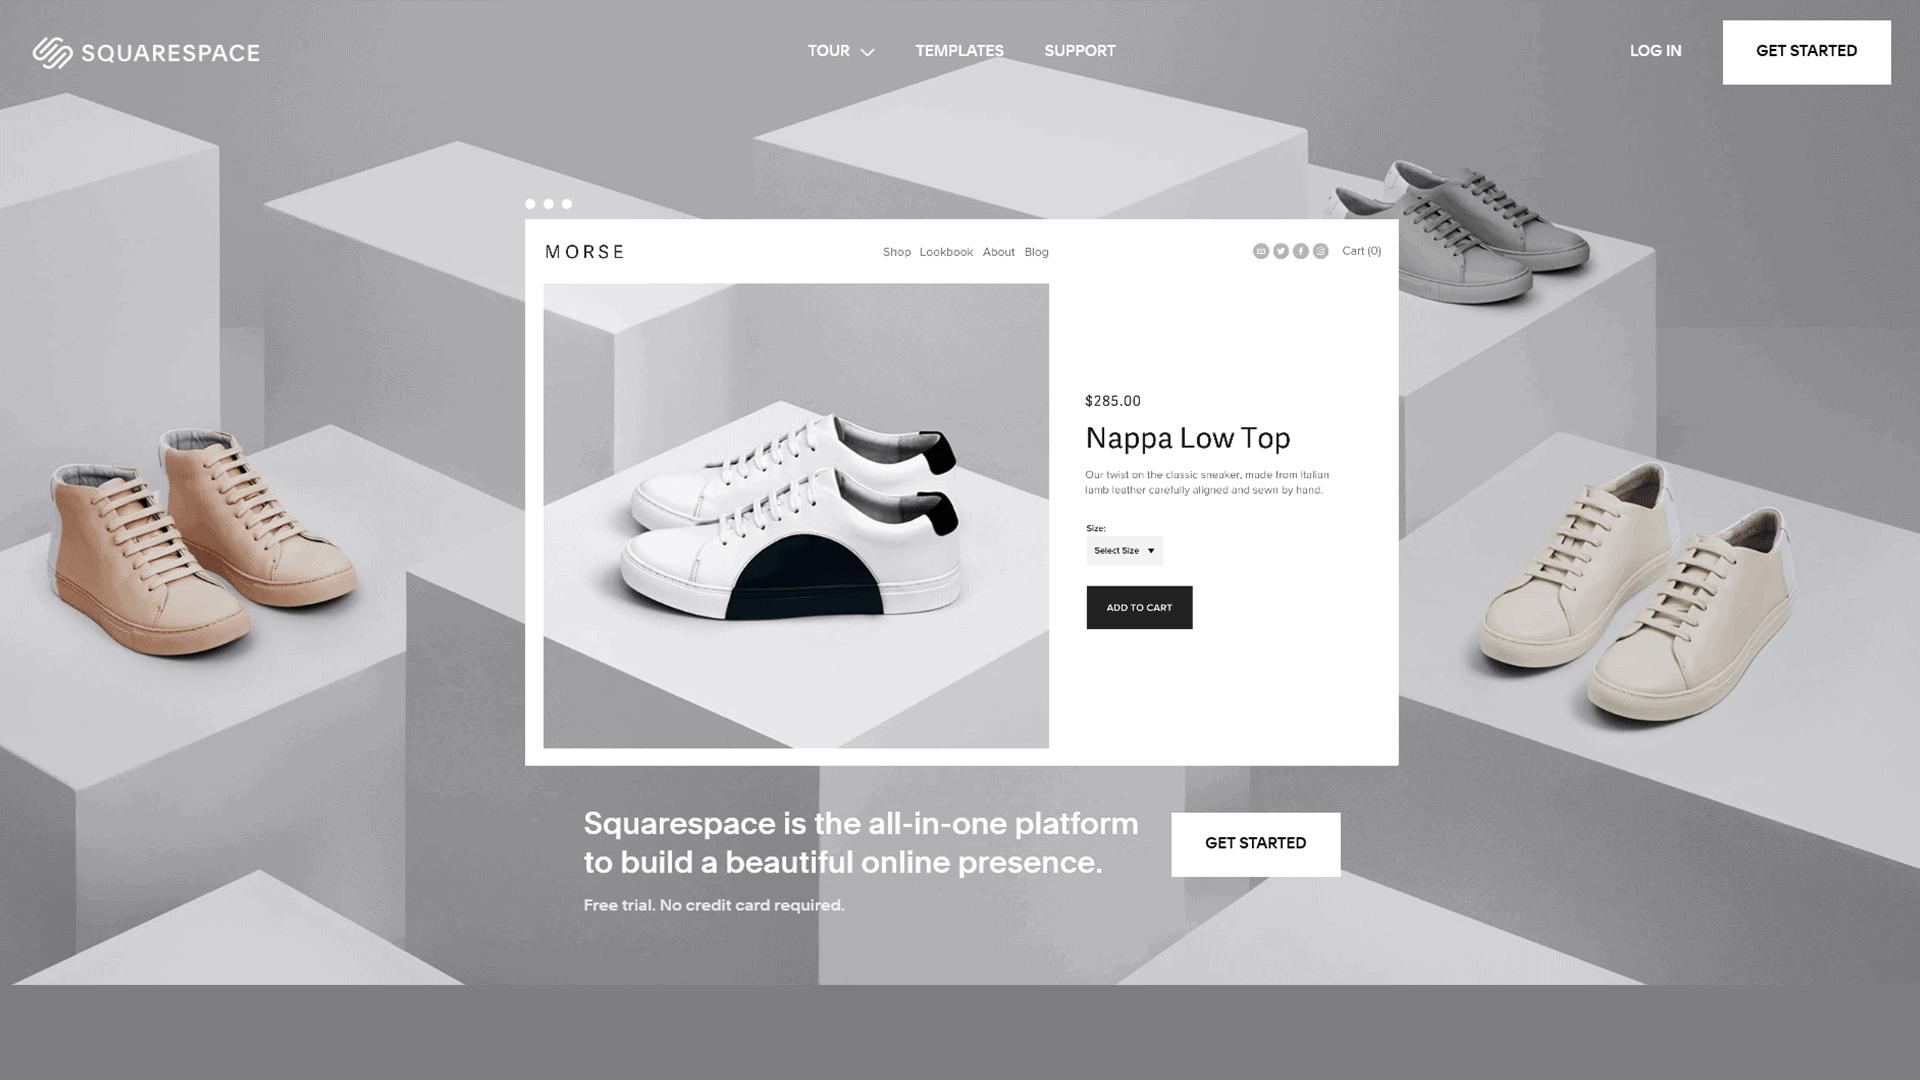 Squarespace-builde